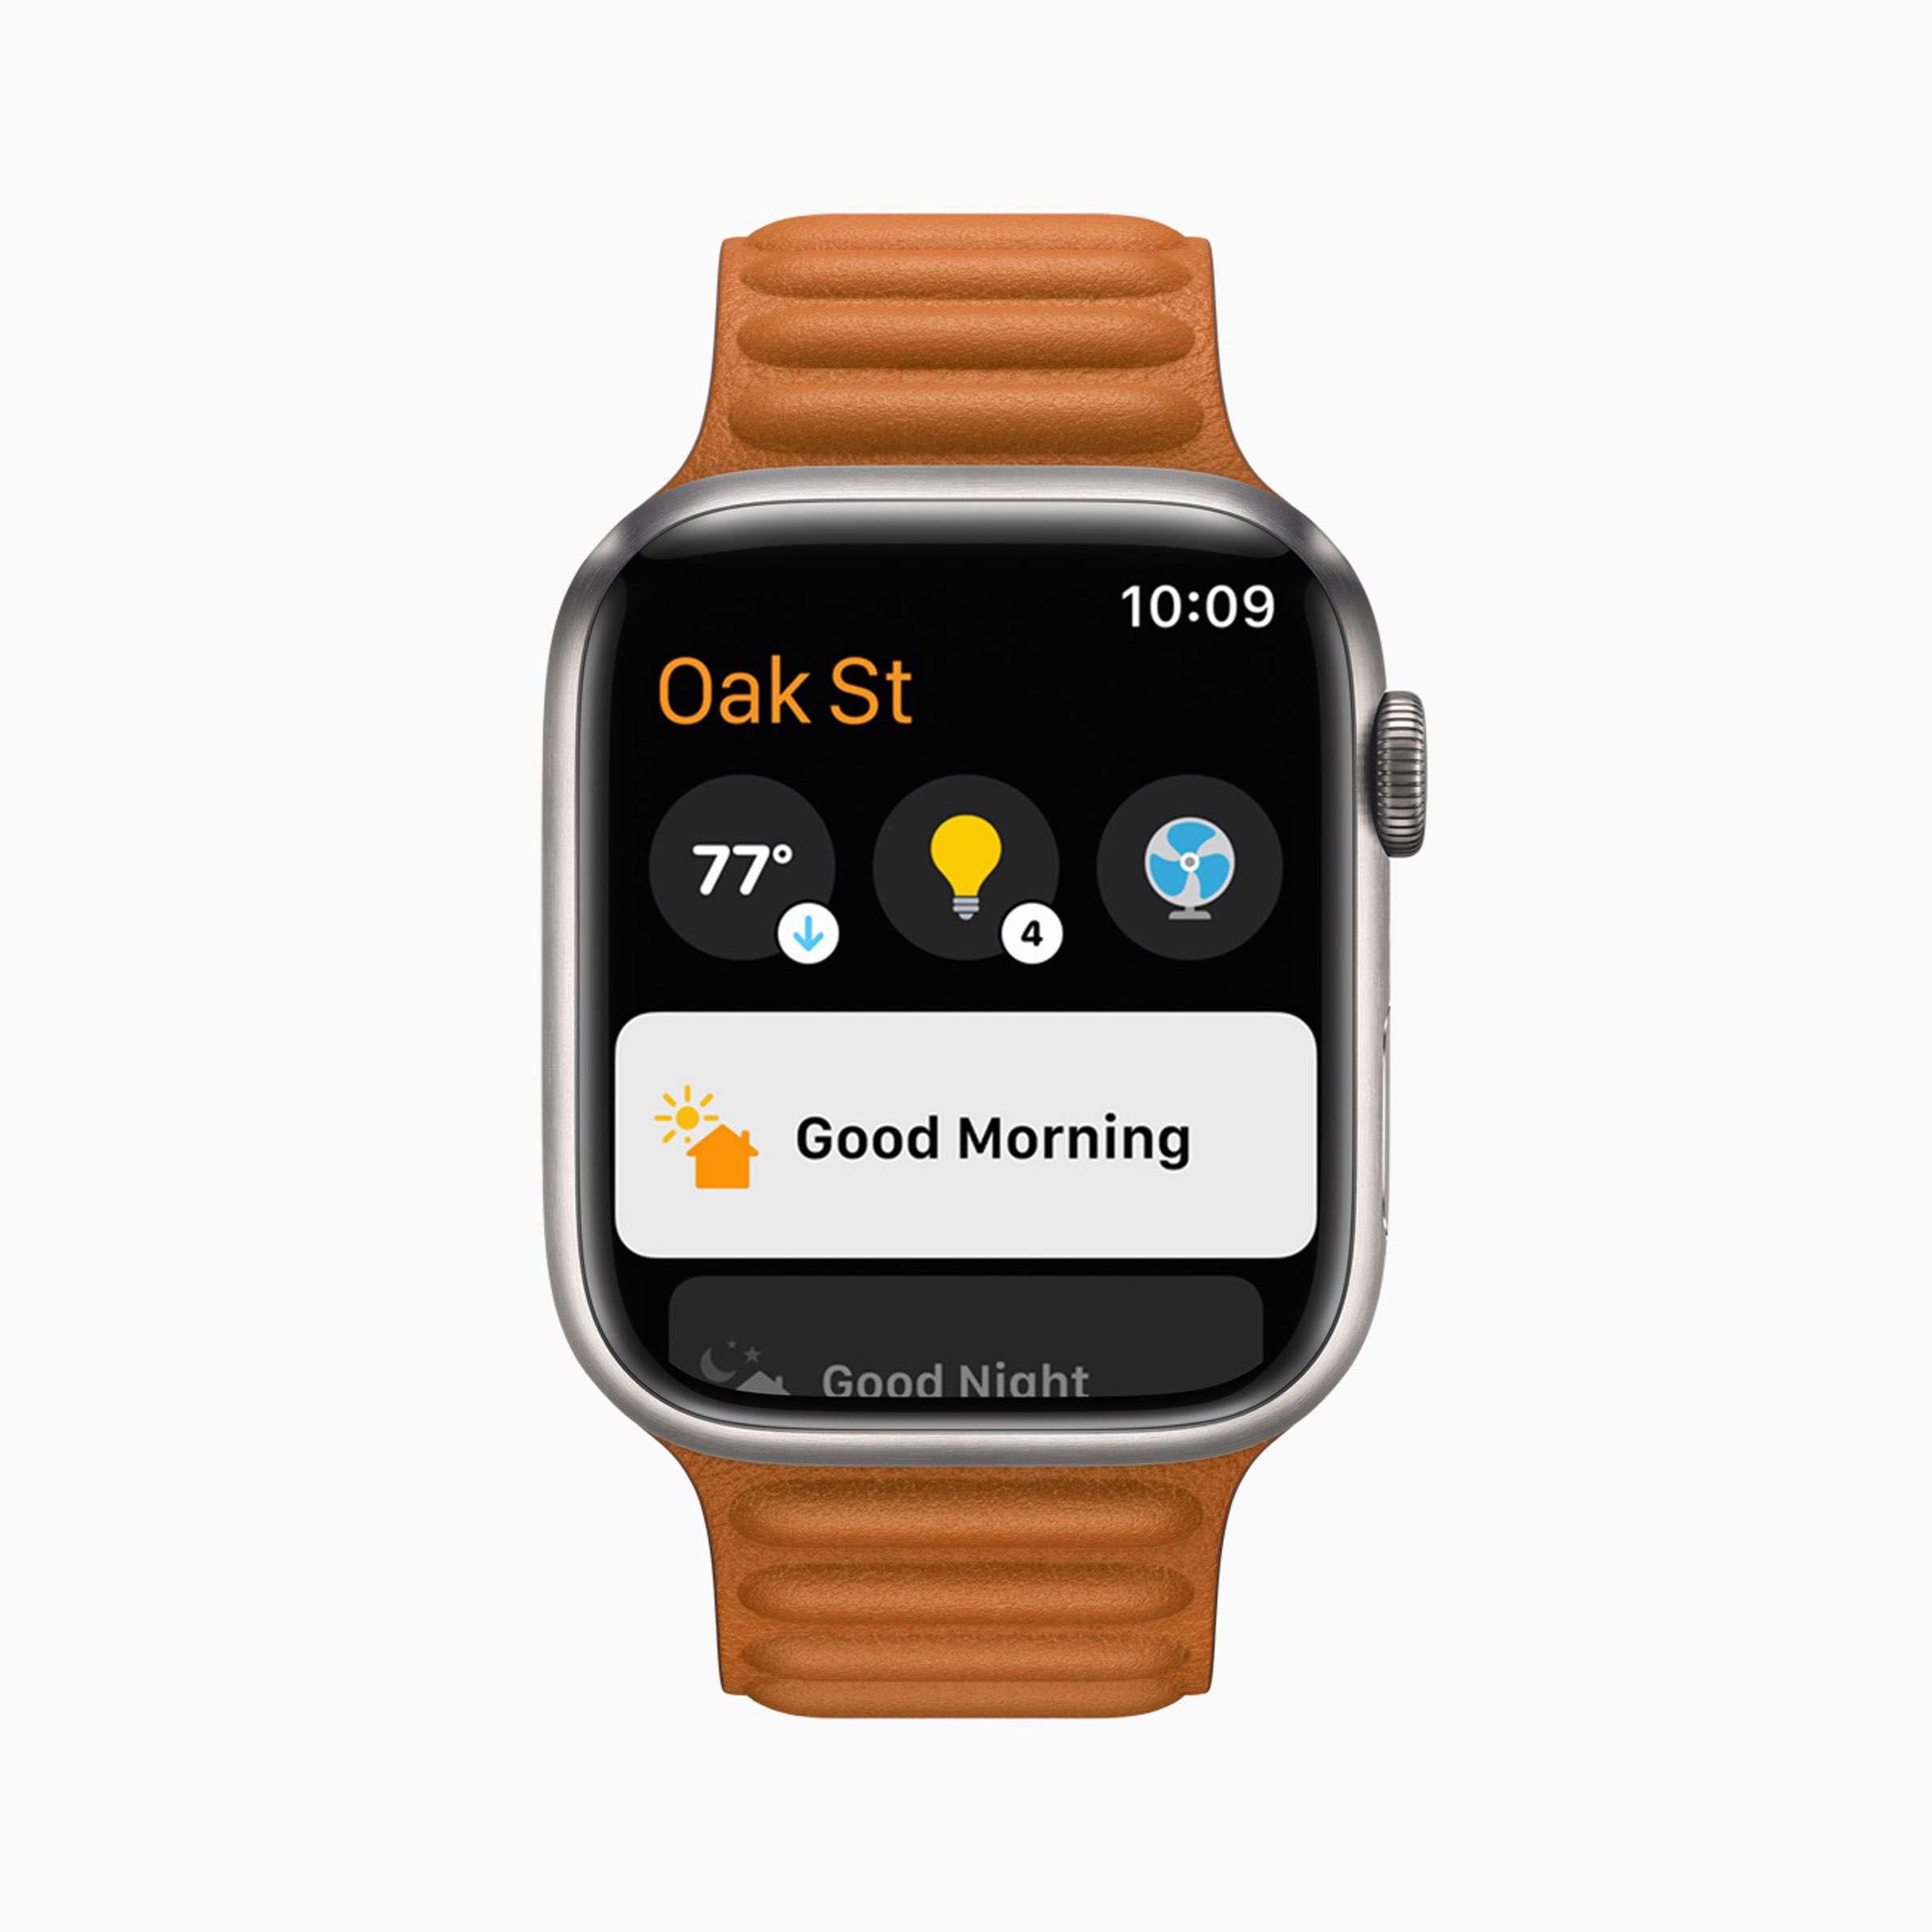 Apple Watch - HomeKit